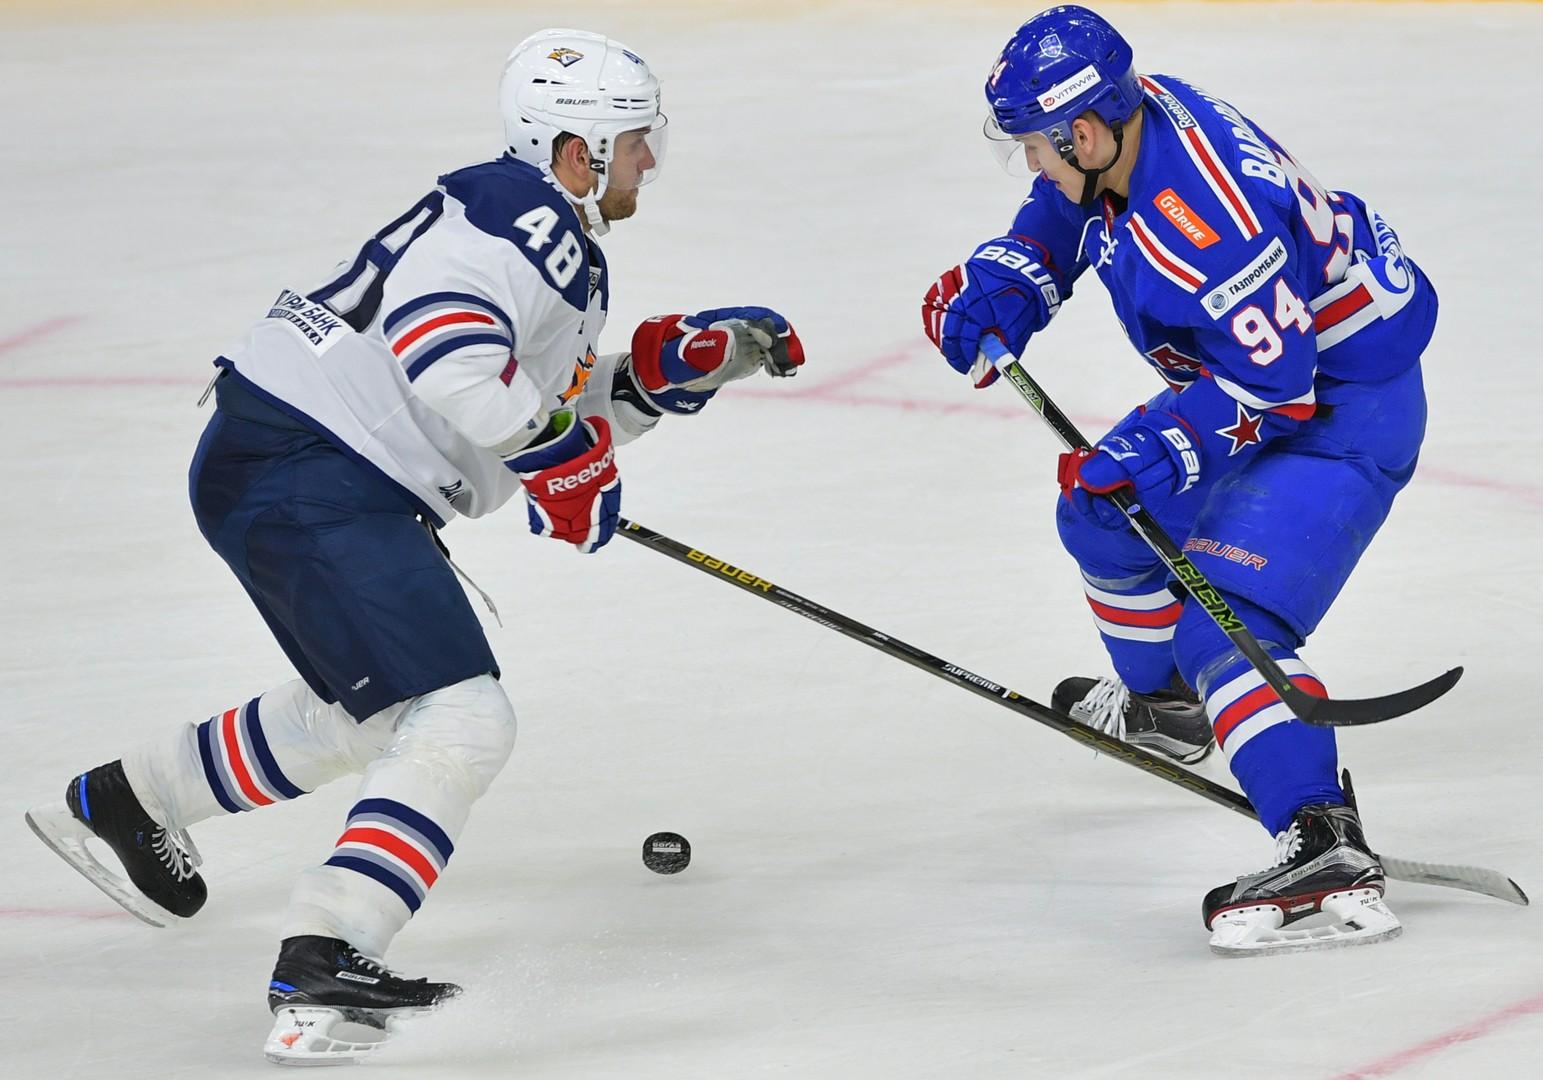 Хоккей без чудес: почему финал Кубка Гагарина СКА — «Металлург» неизбежен